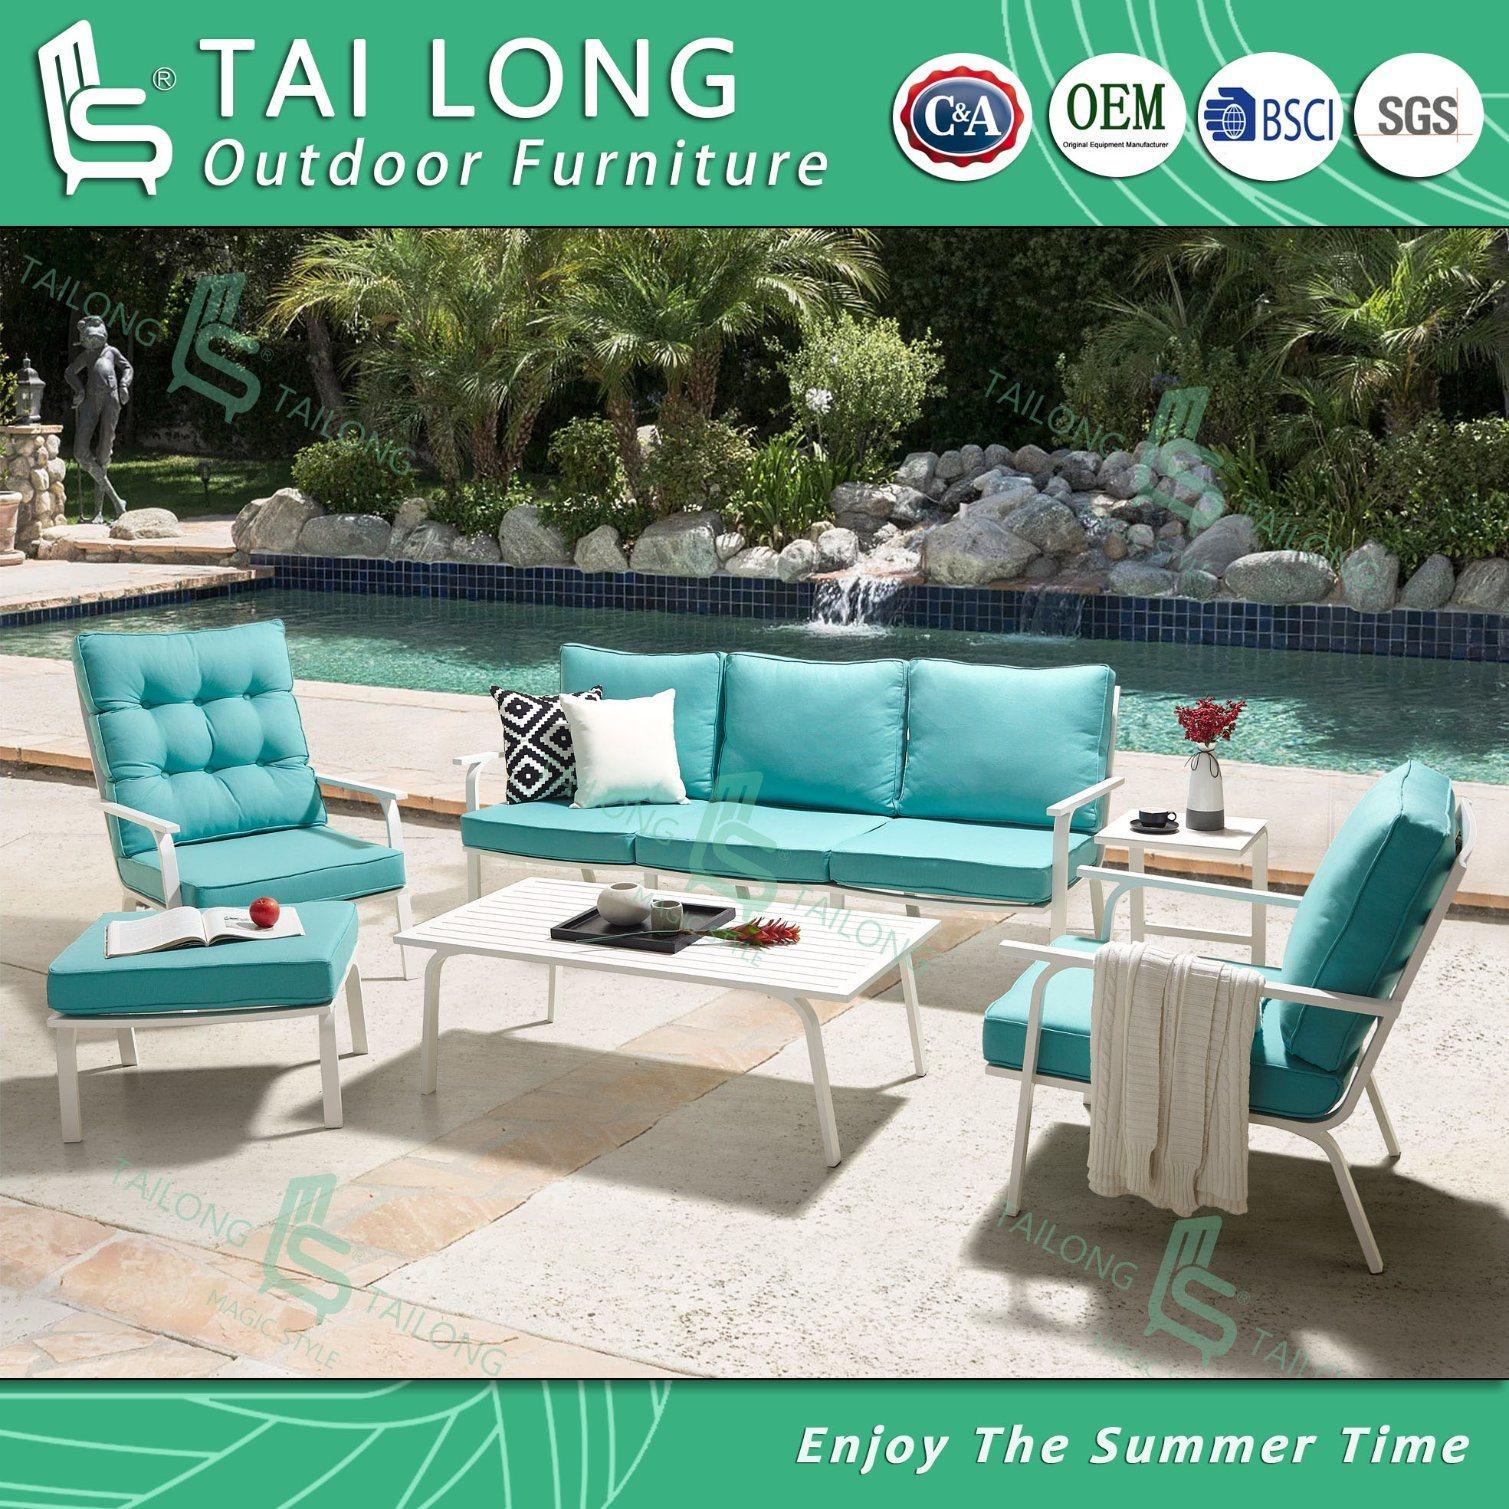 - Chinese Outdoor Sofa Set With Cushion Garden Lounge Sofa Patio